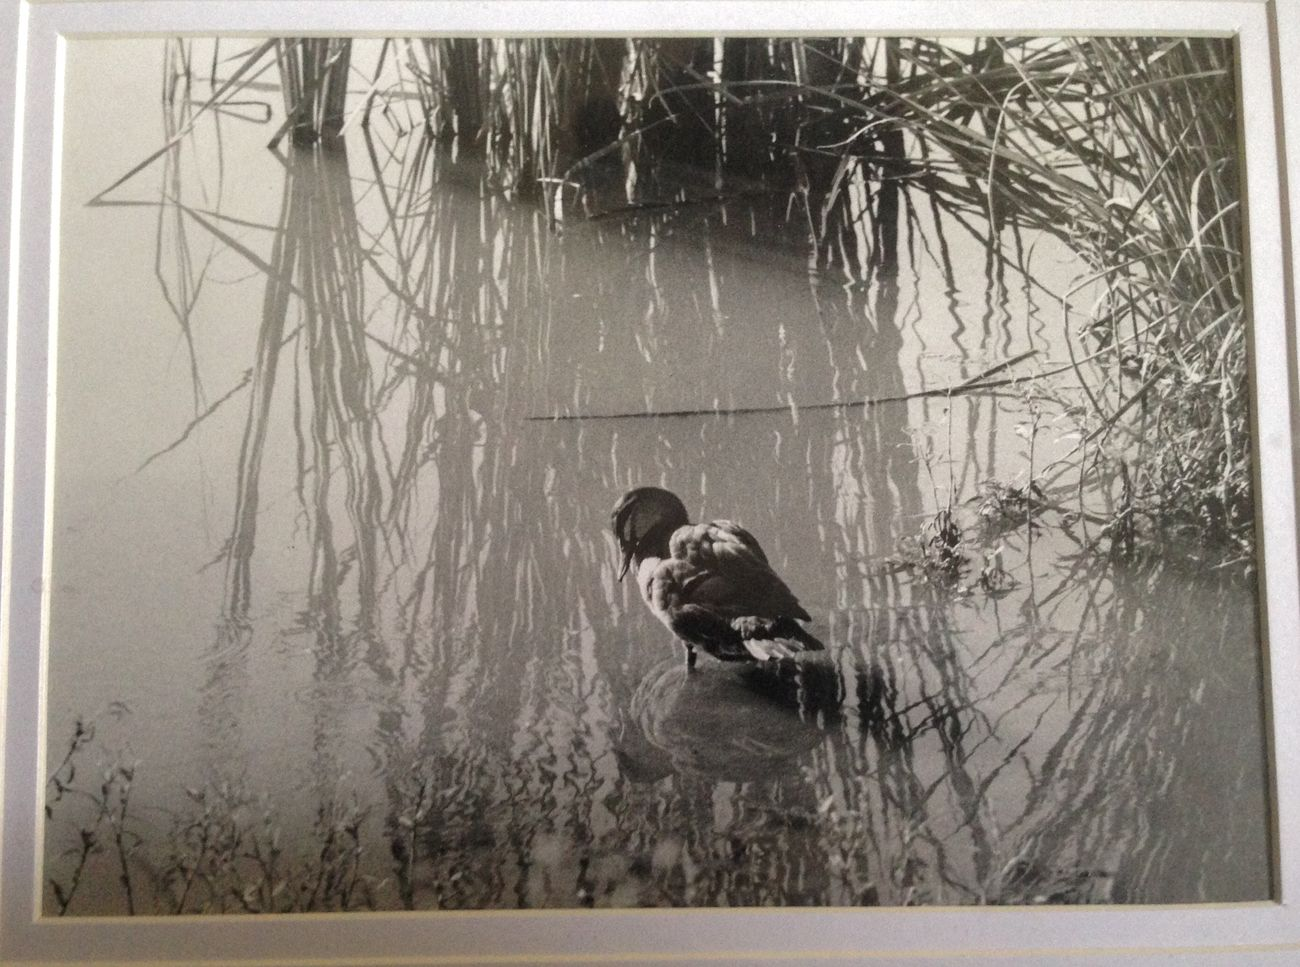 Analogue Photography Analog Analogue Birds Water Reflections Blackandwhite Monochrome Sepia